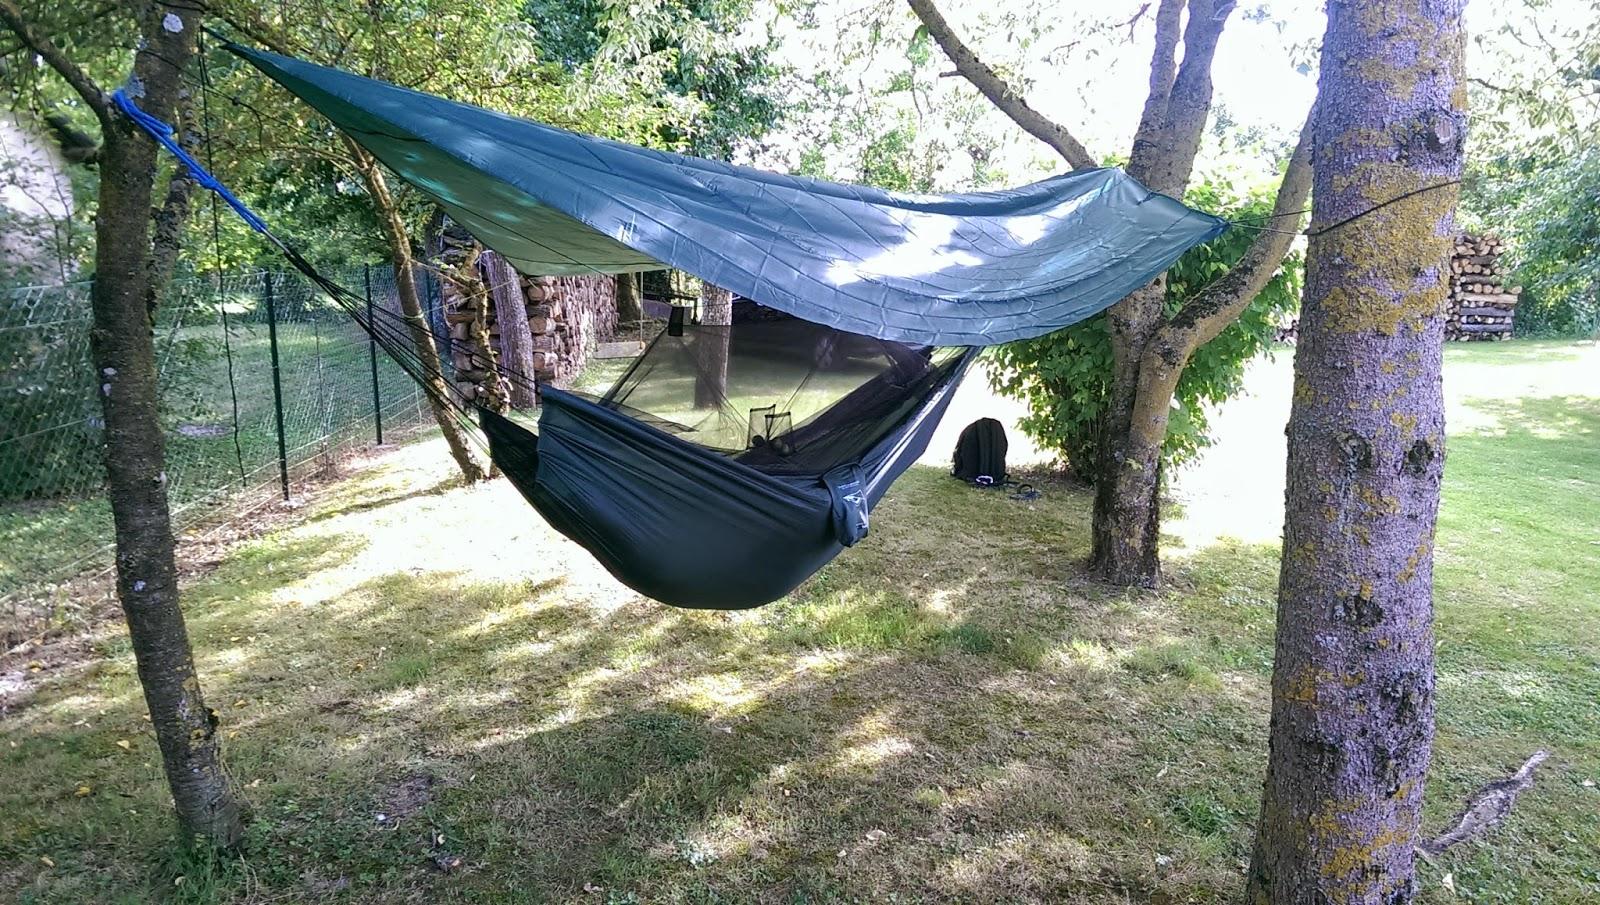 le voyage de mitheo comparatif entre le hamac. Black Bedroom Furniture Sets. Home Design Ideas